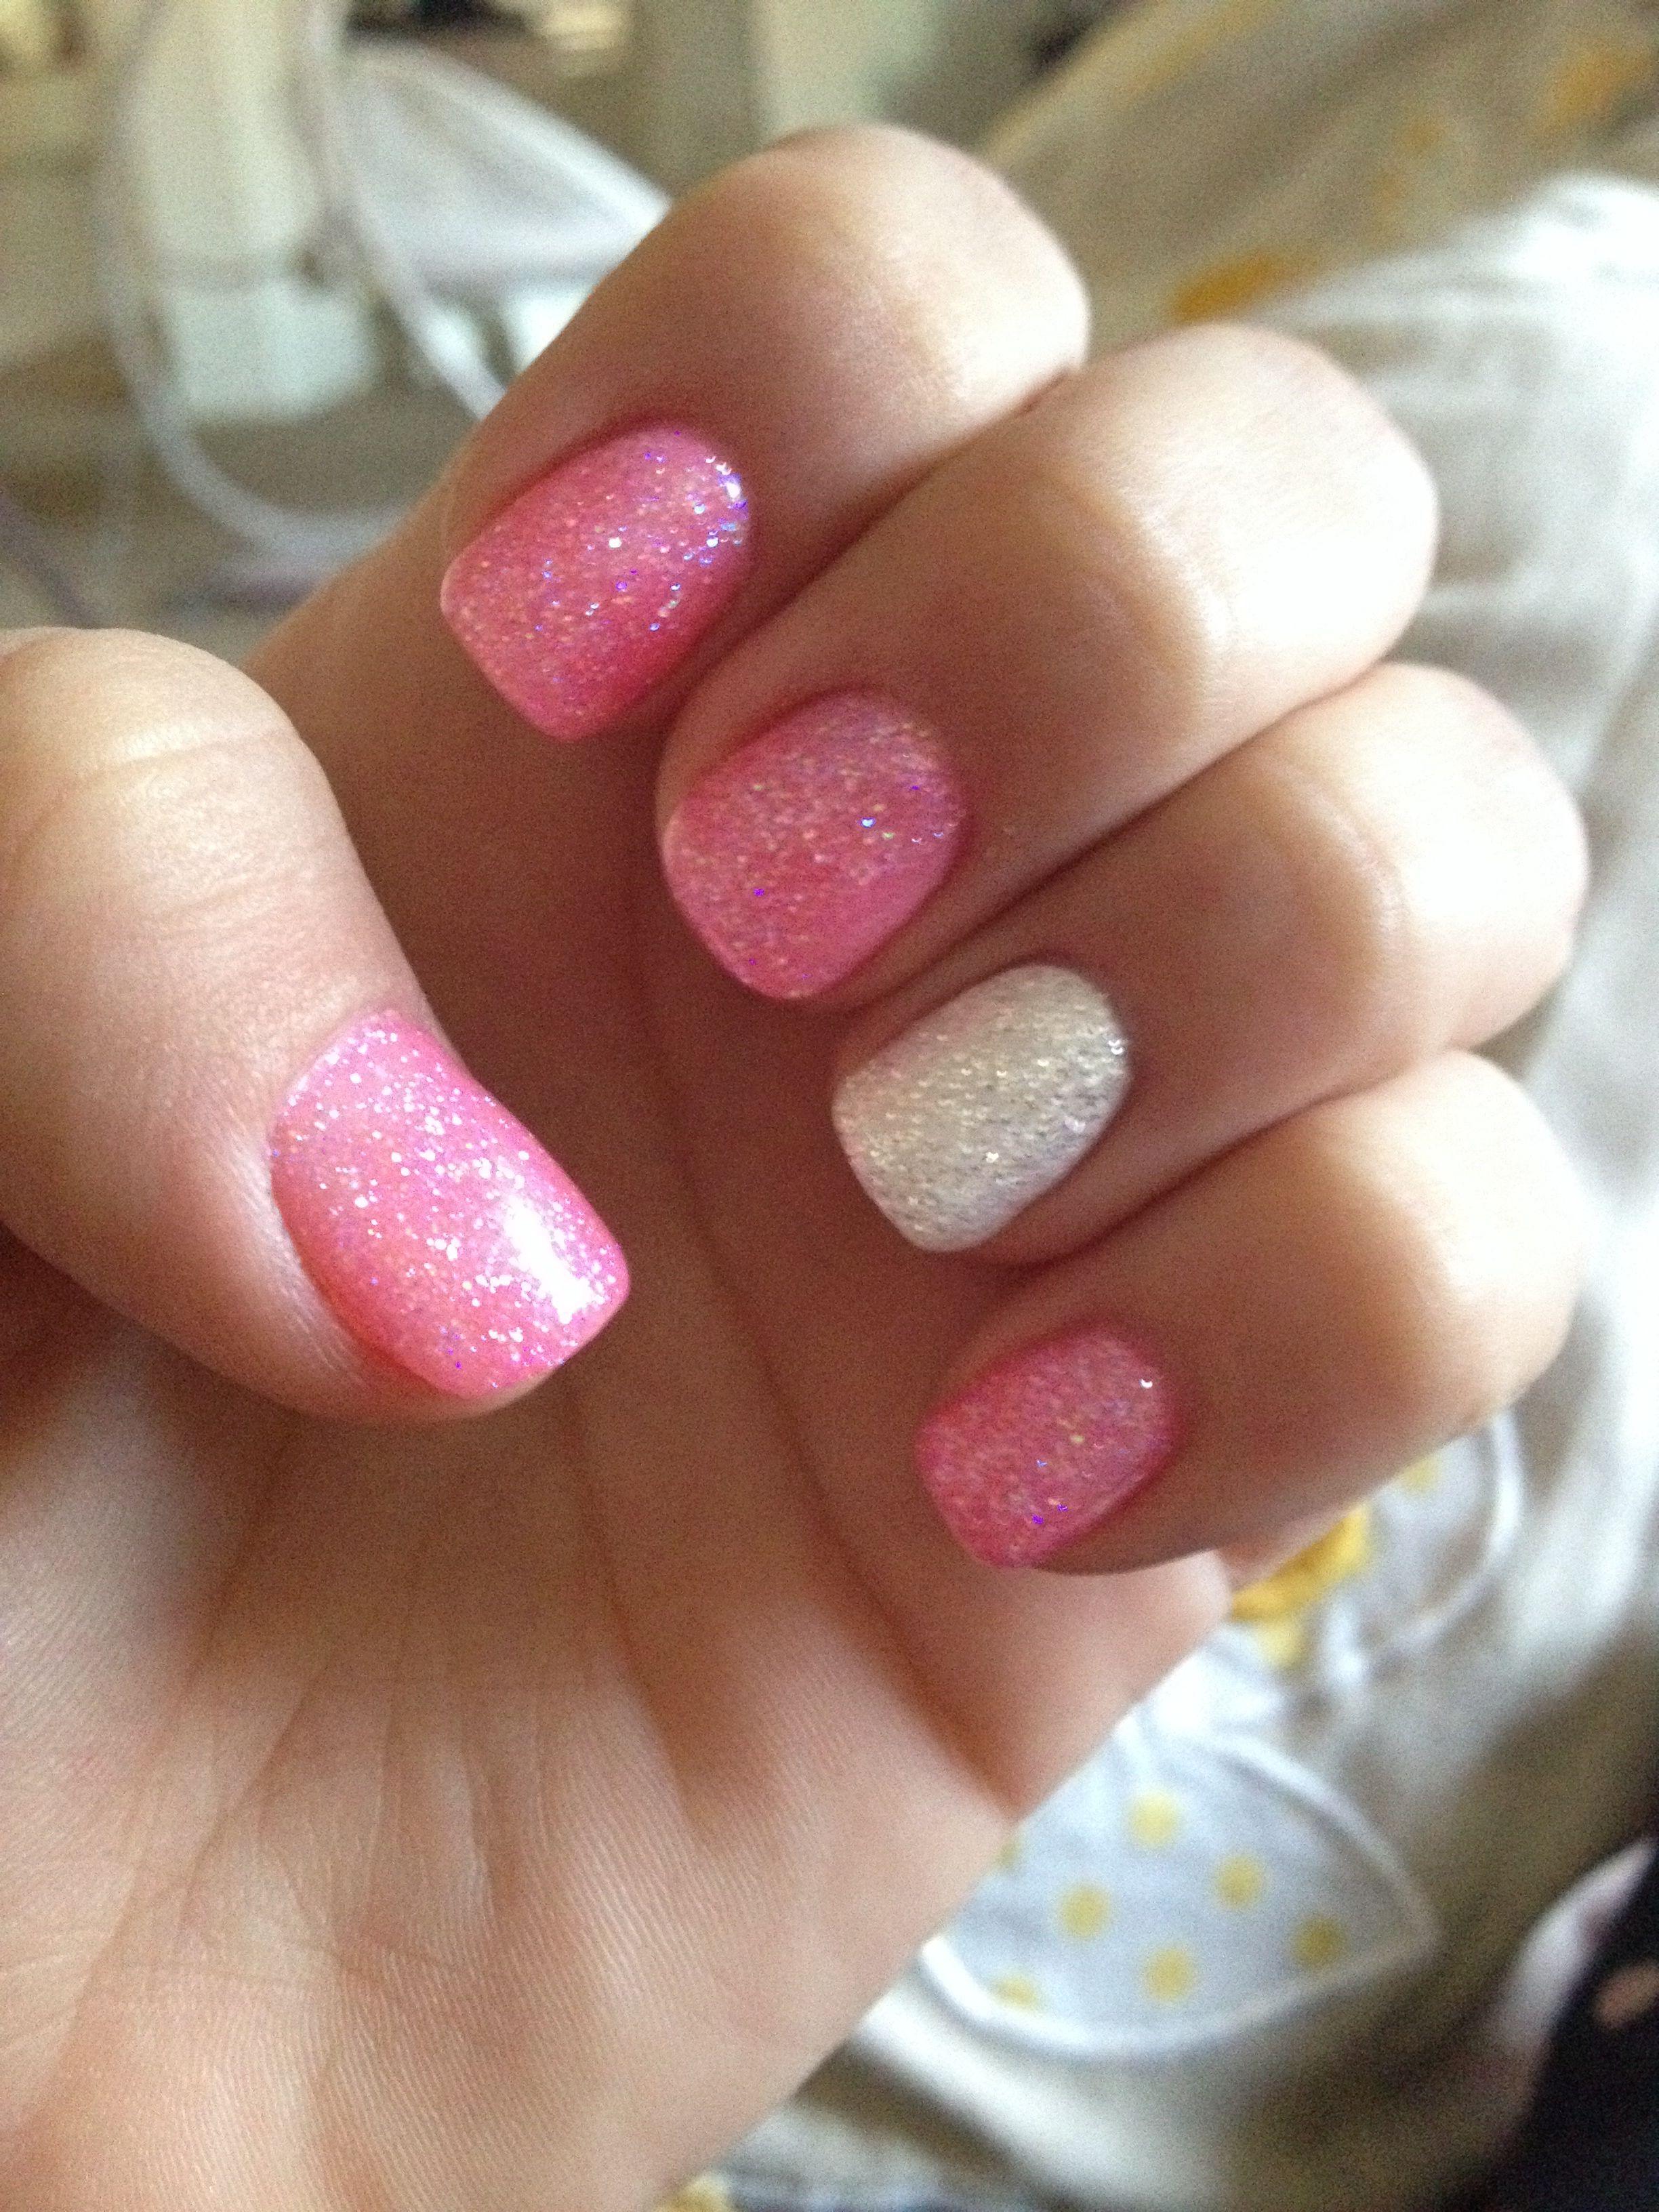 Pin By Tiffany Corbett On Nails Glitter Gel Nails Pink Nails Pink Glitter Nails